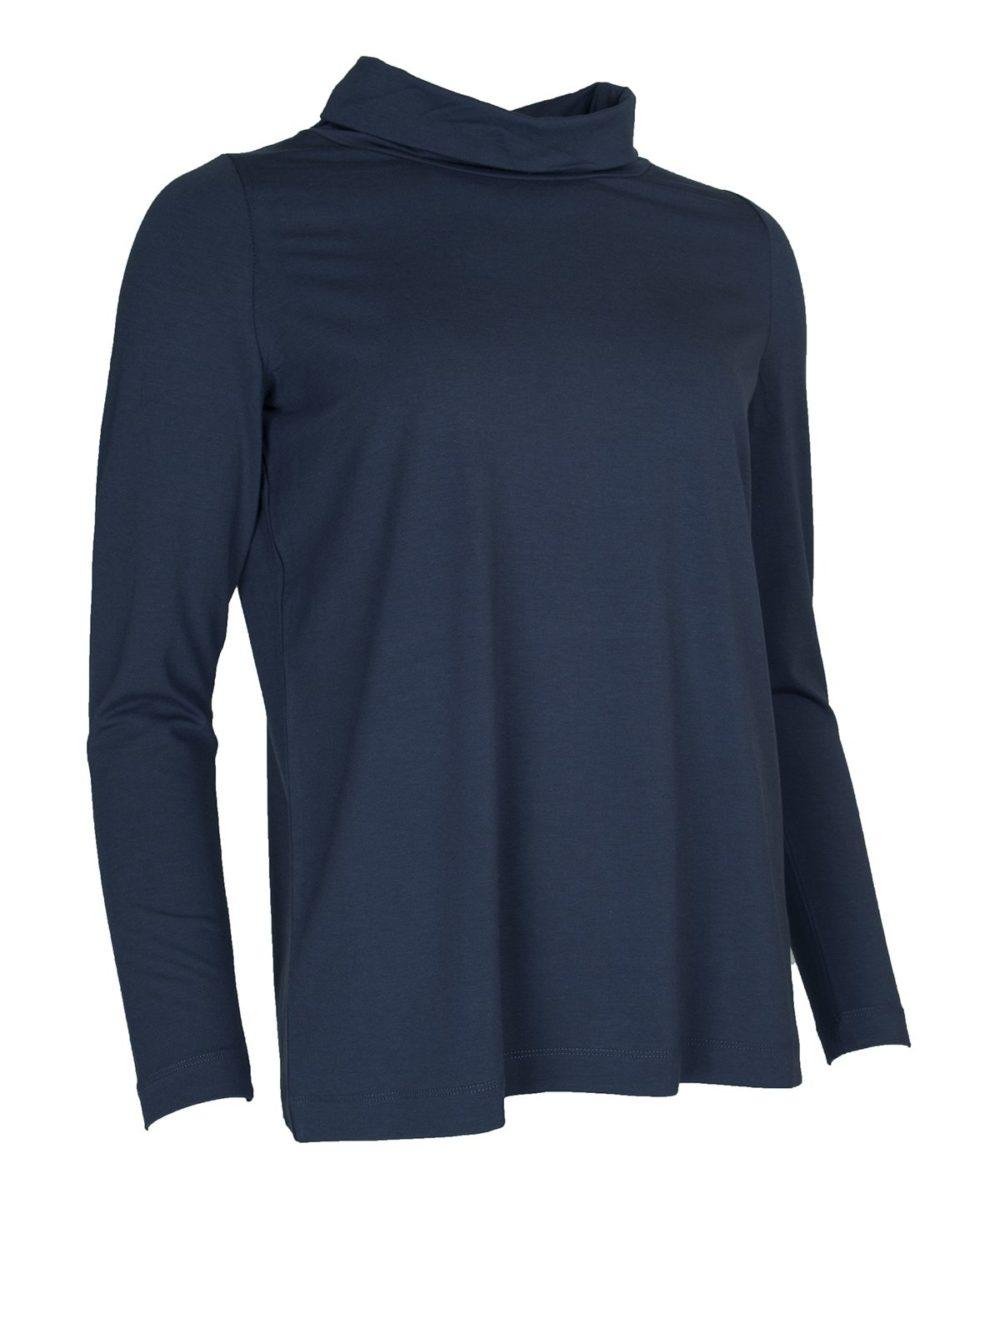 Benedicte polo t shirt